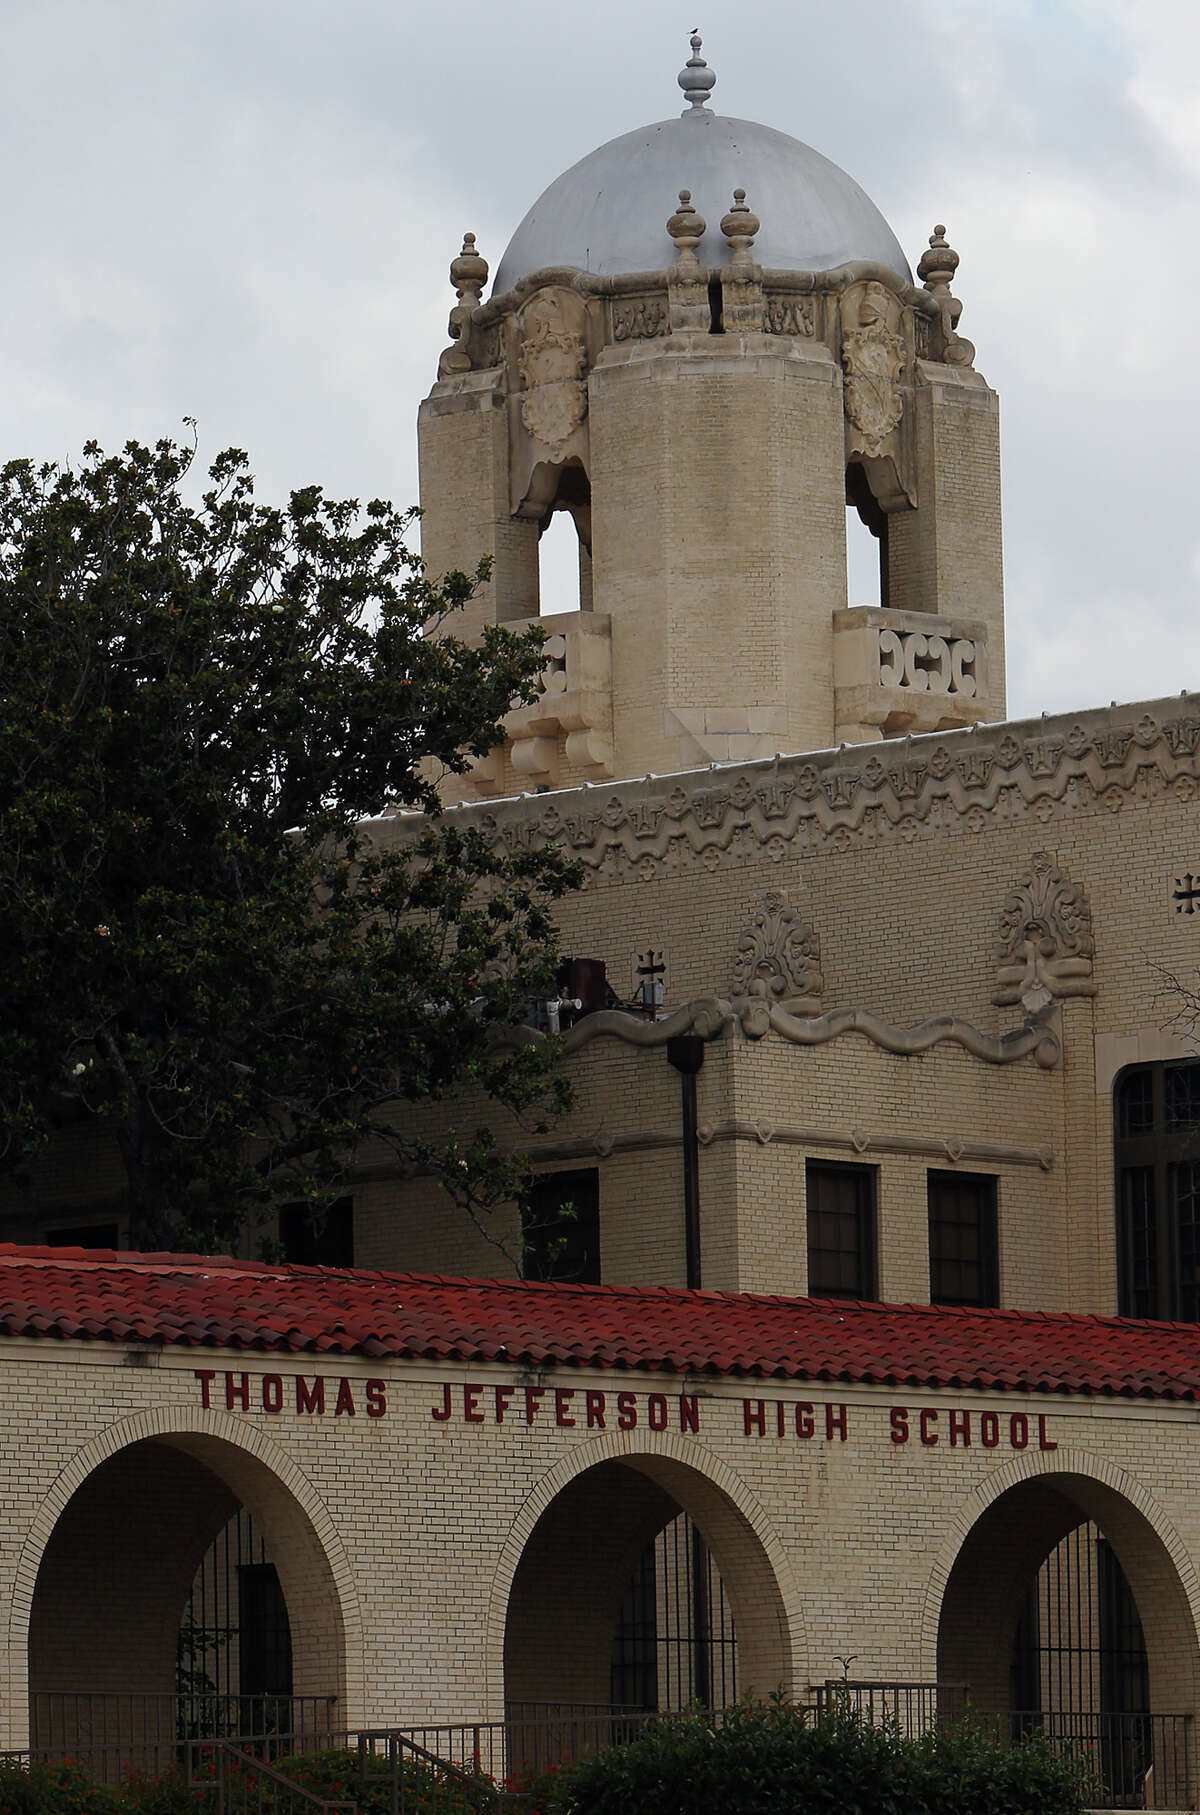 Images of Jefferson High School for Cityscape on Thursday, June 21, 2012.